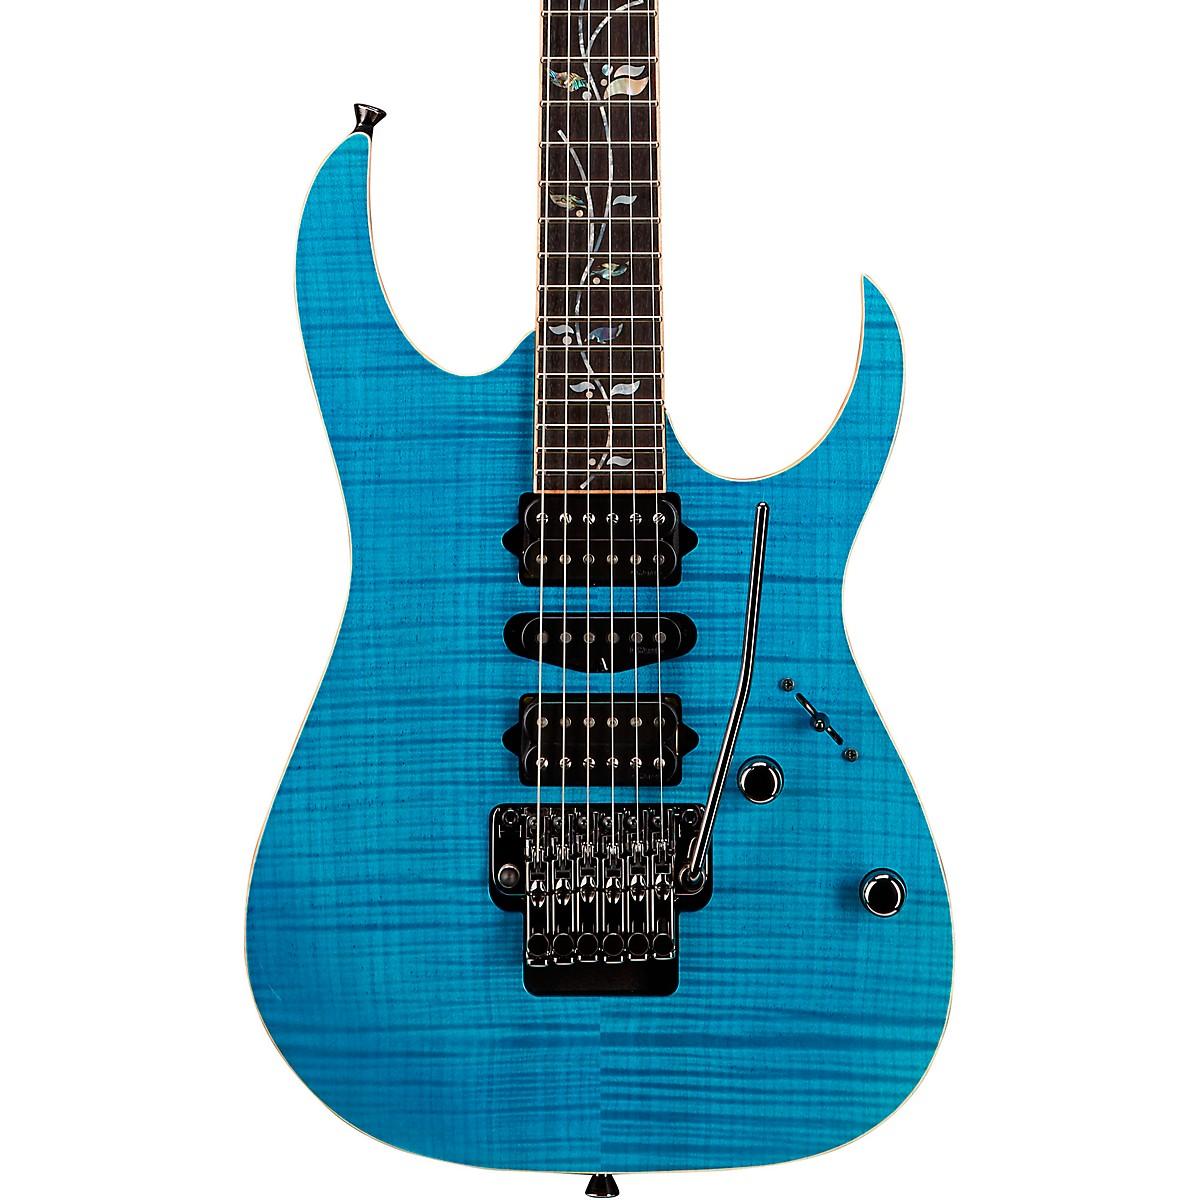 Ibanez RG8570Z j.custom Electric Guitar